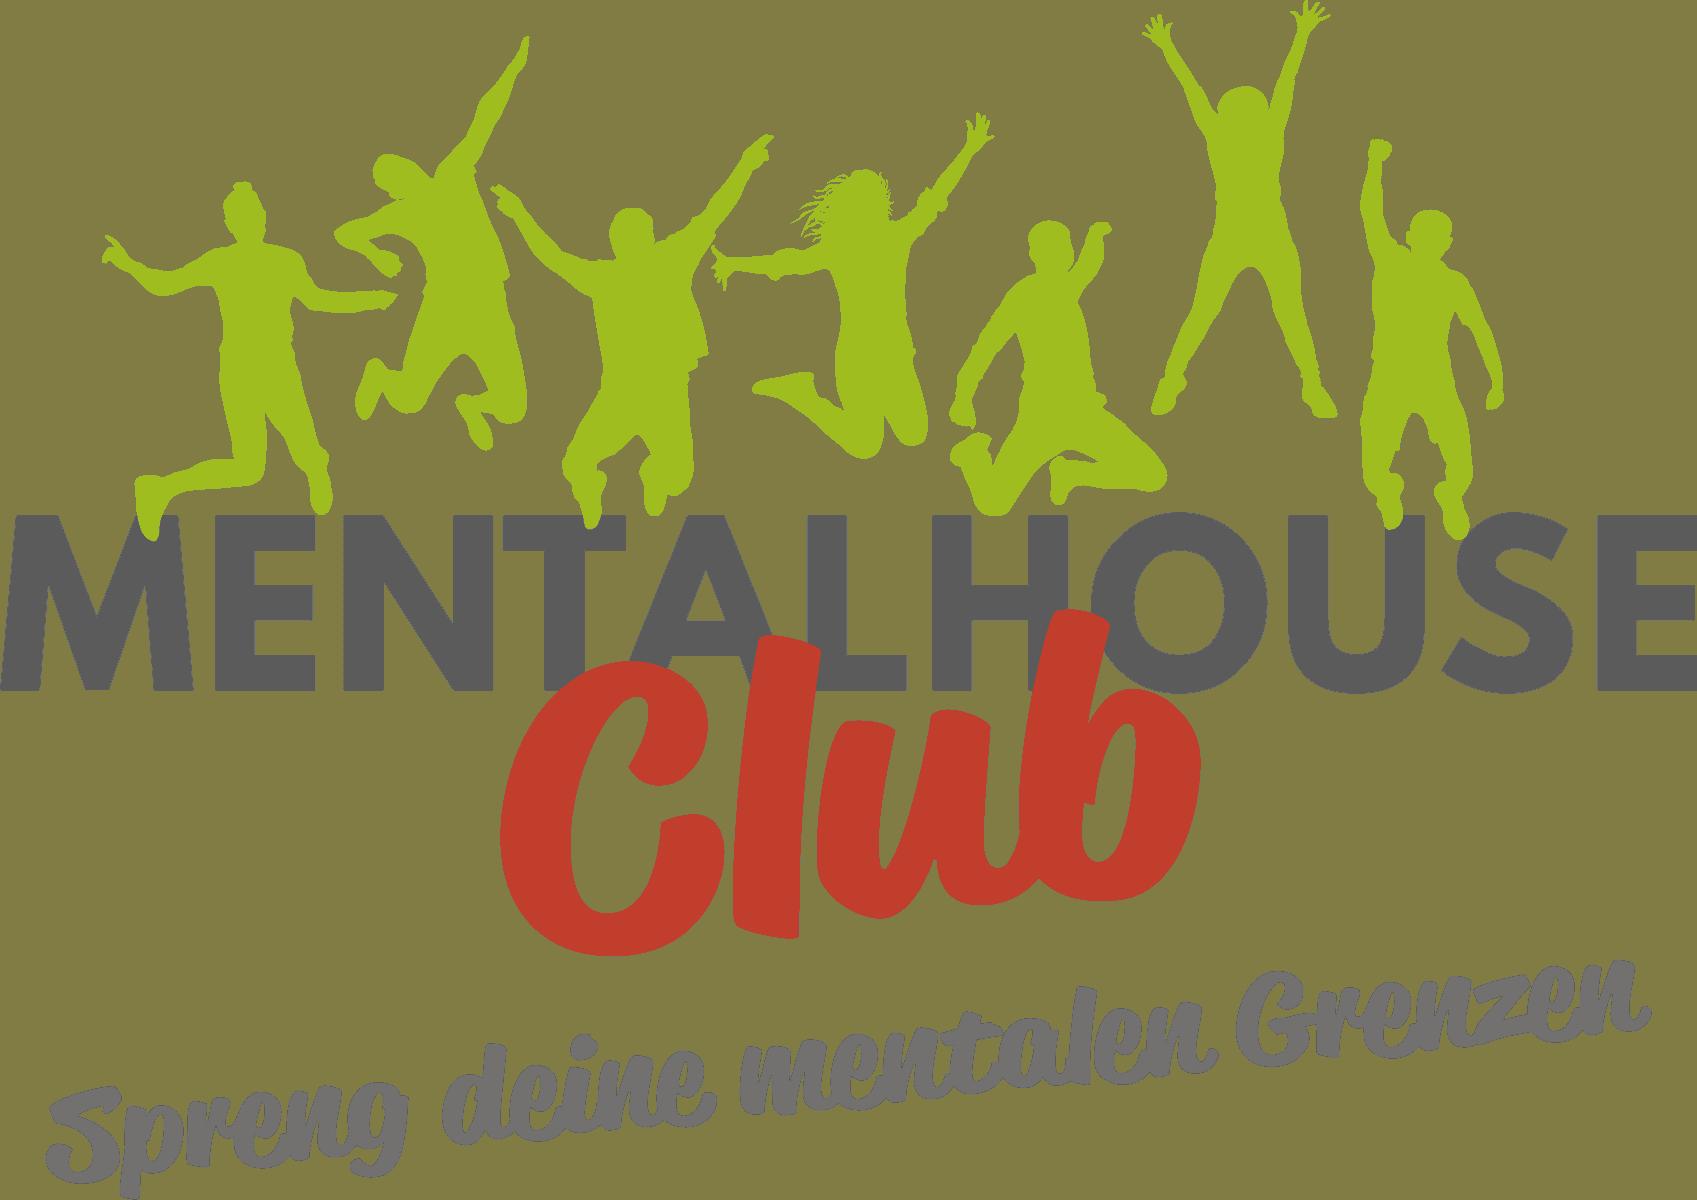 MentalHouse Club